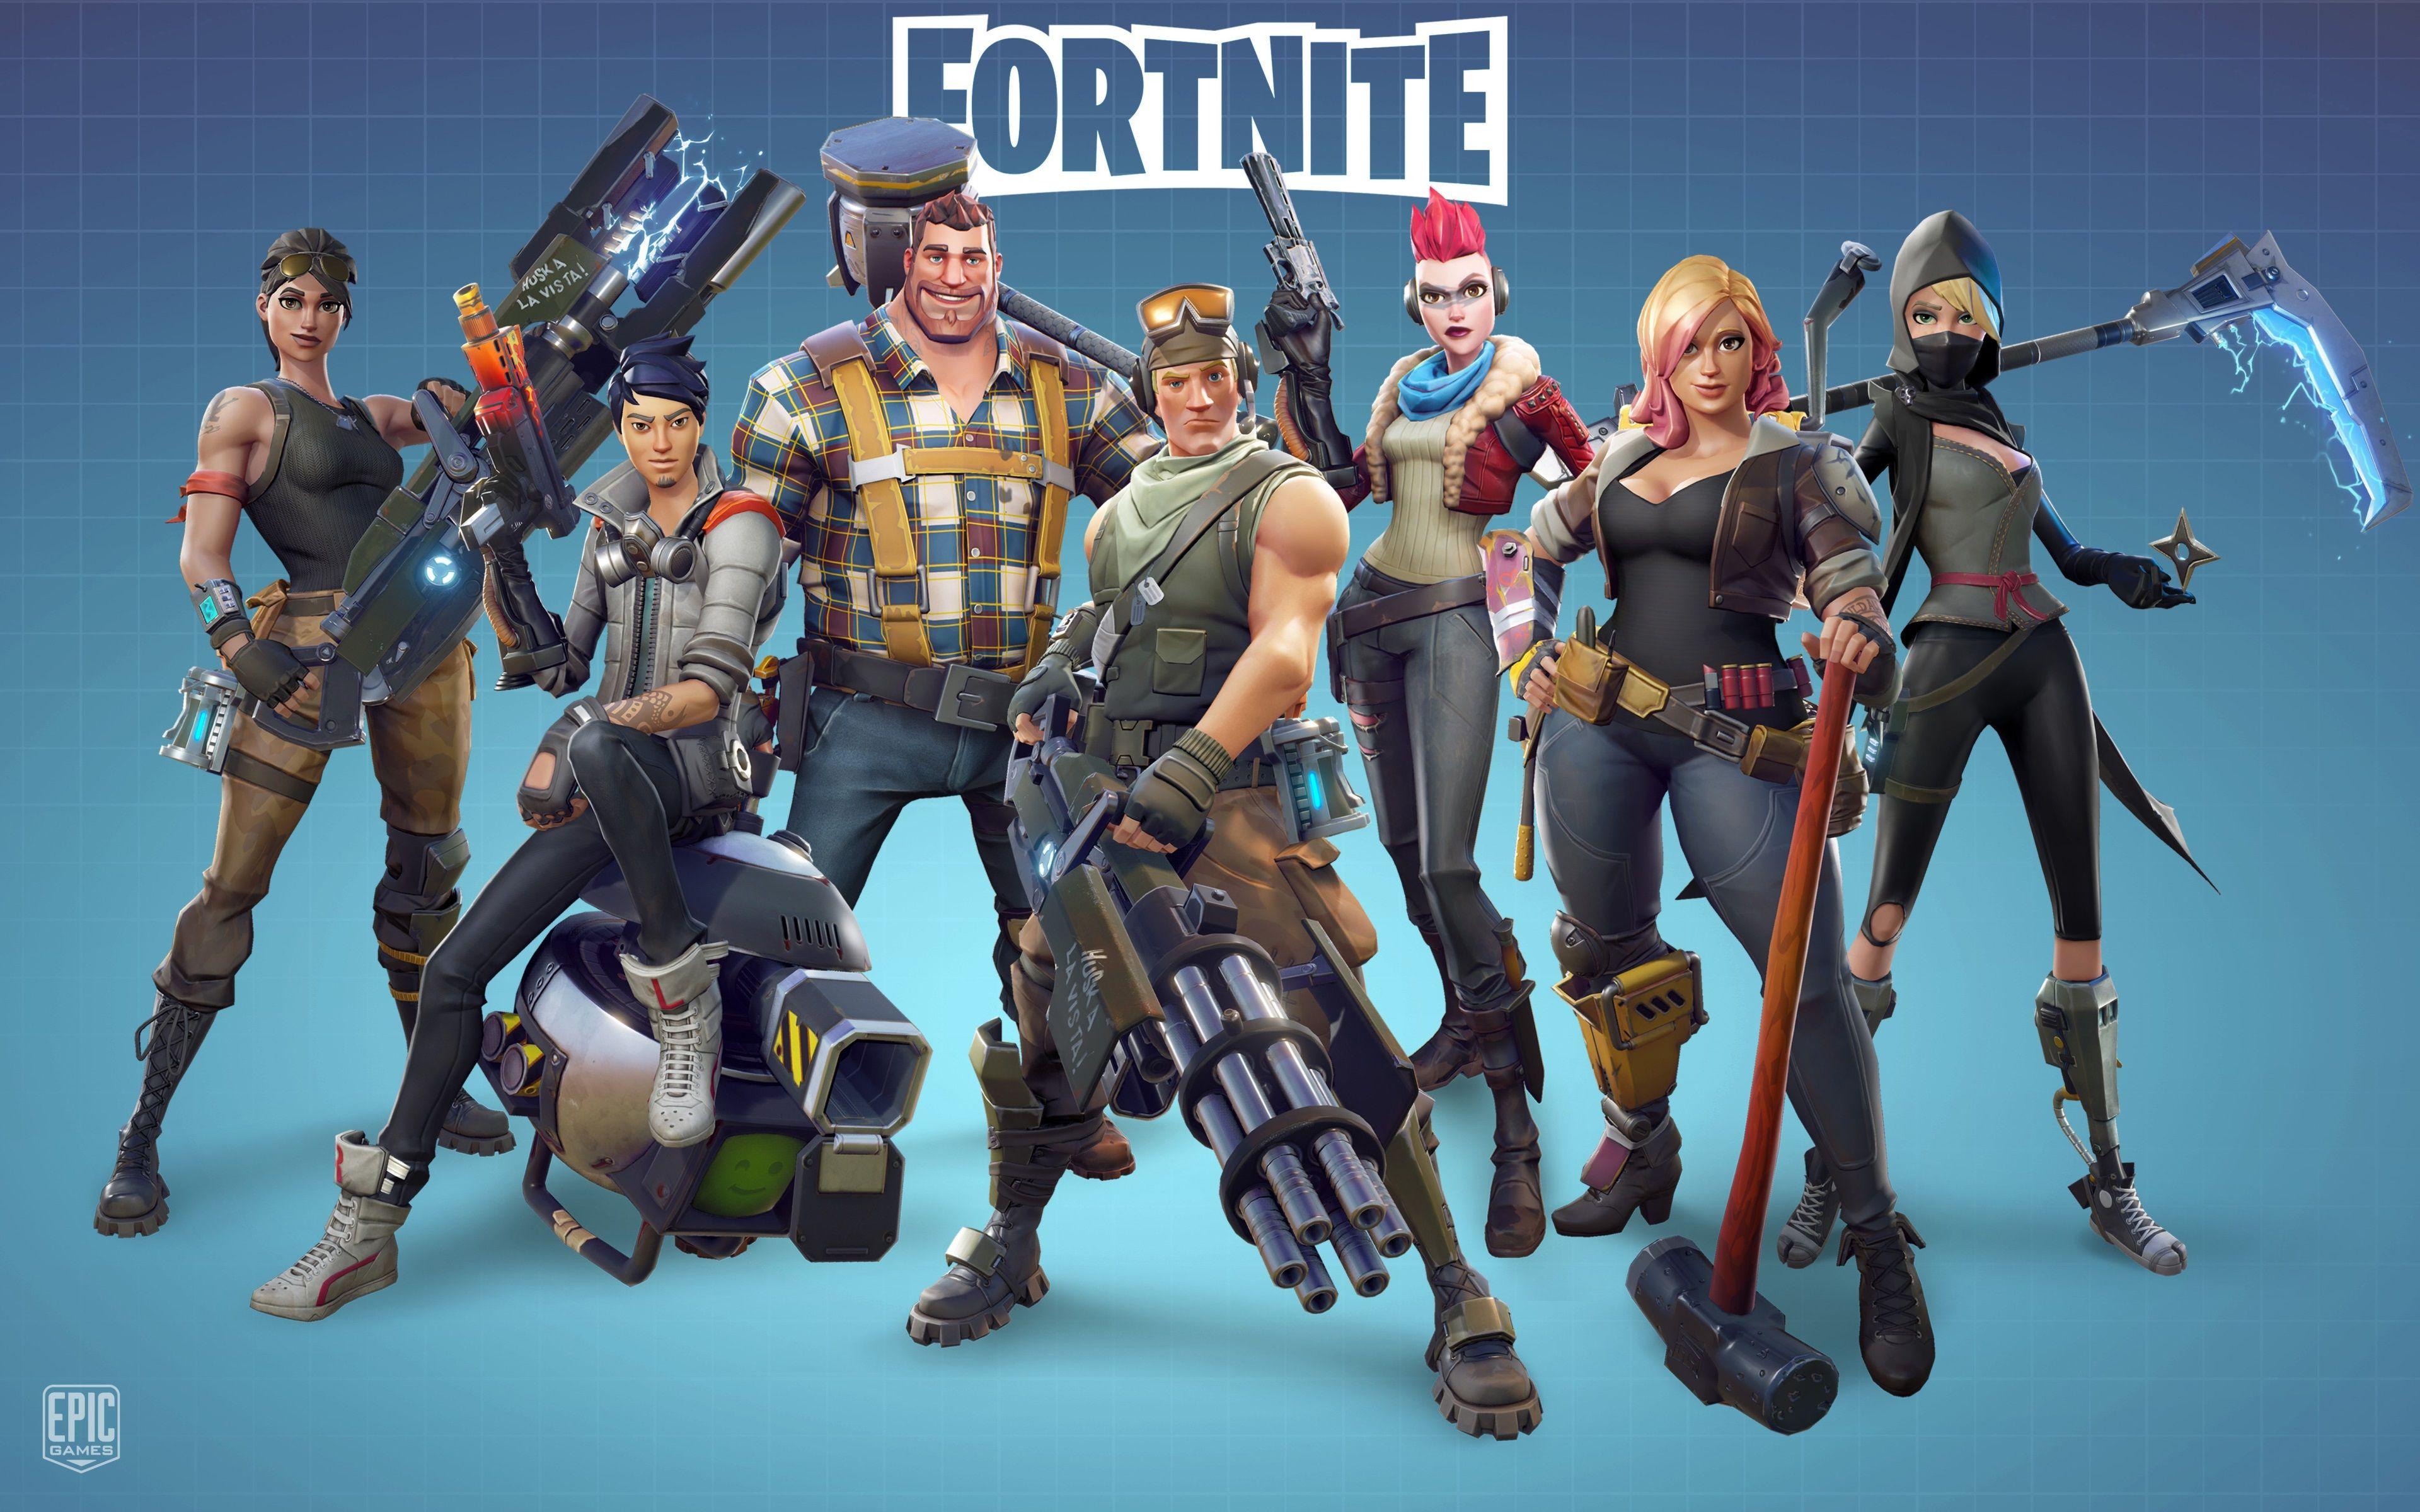 Wallpaper S Name 3840x2400 Fortnite 4k Full Hd Desktop Wallpaper Free Download Resolution 3840x2400 File Size 171 In 2020 Fortnite Battle Royale Game Gaming Posters